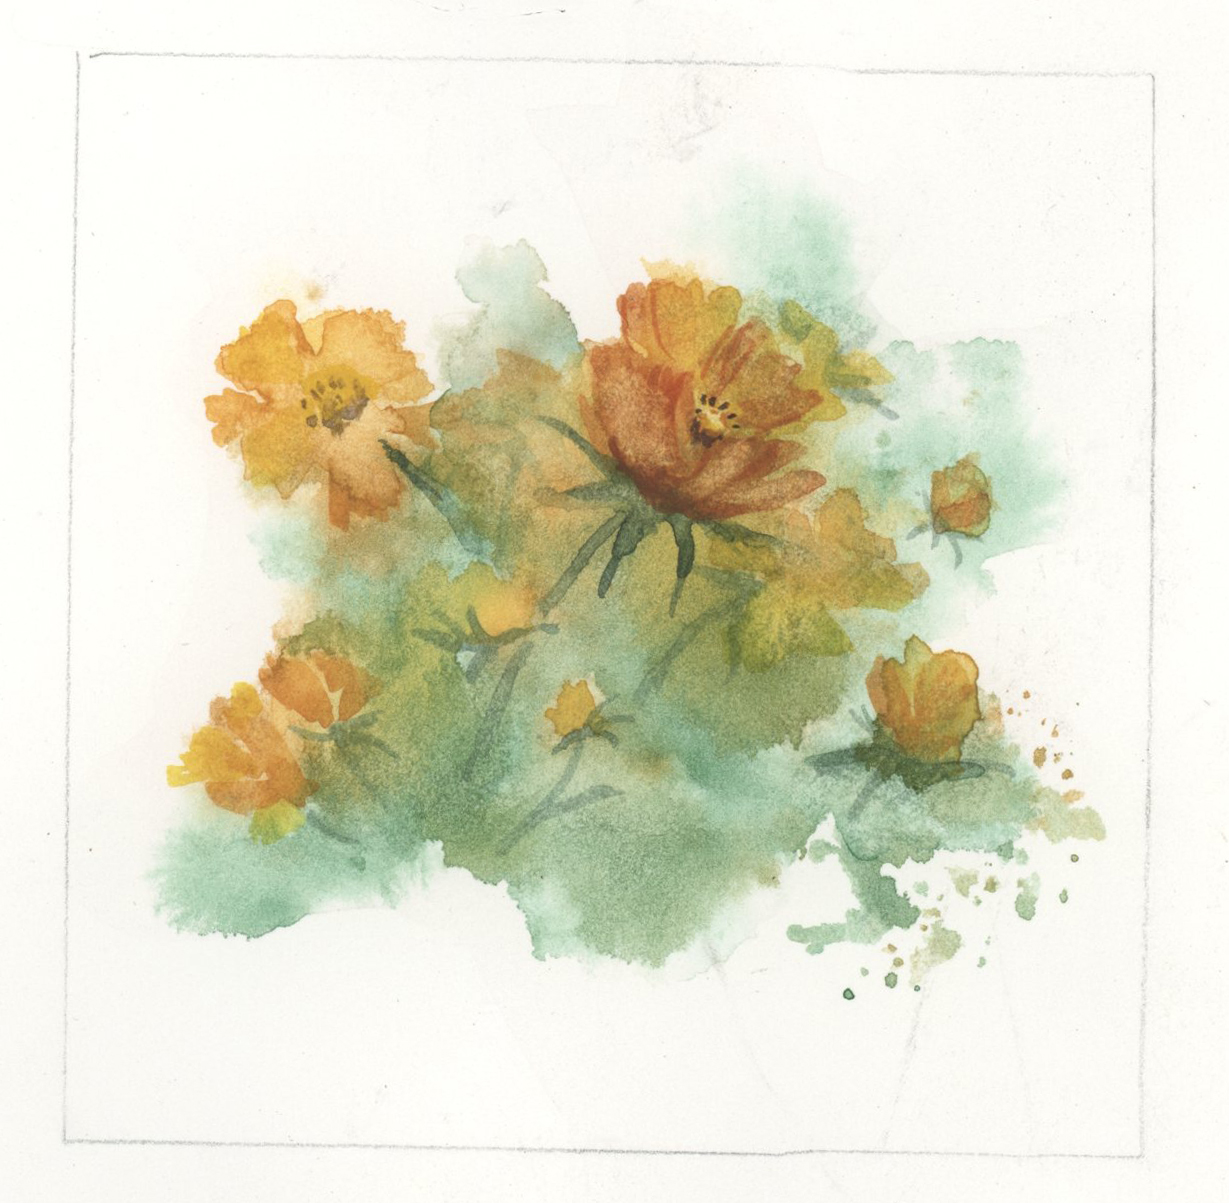 watercolors2.jpg